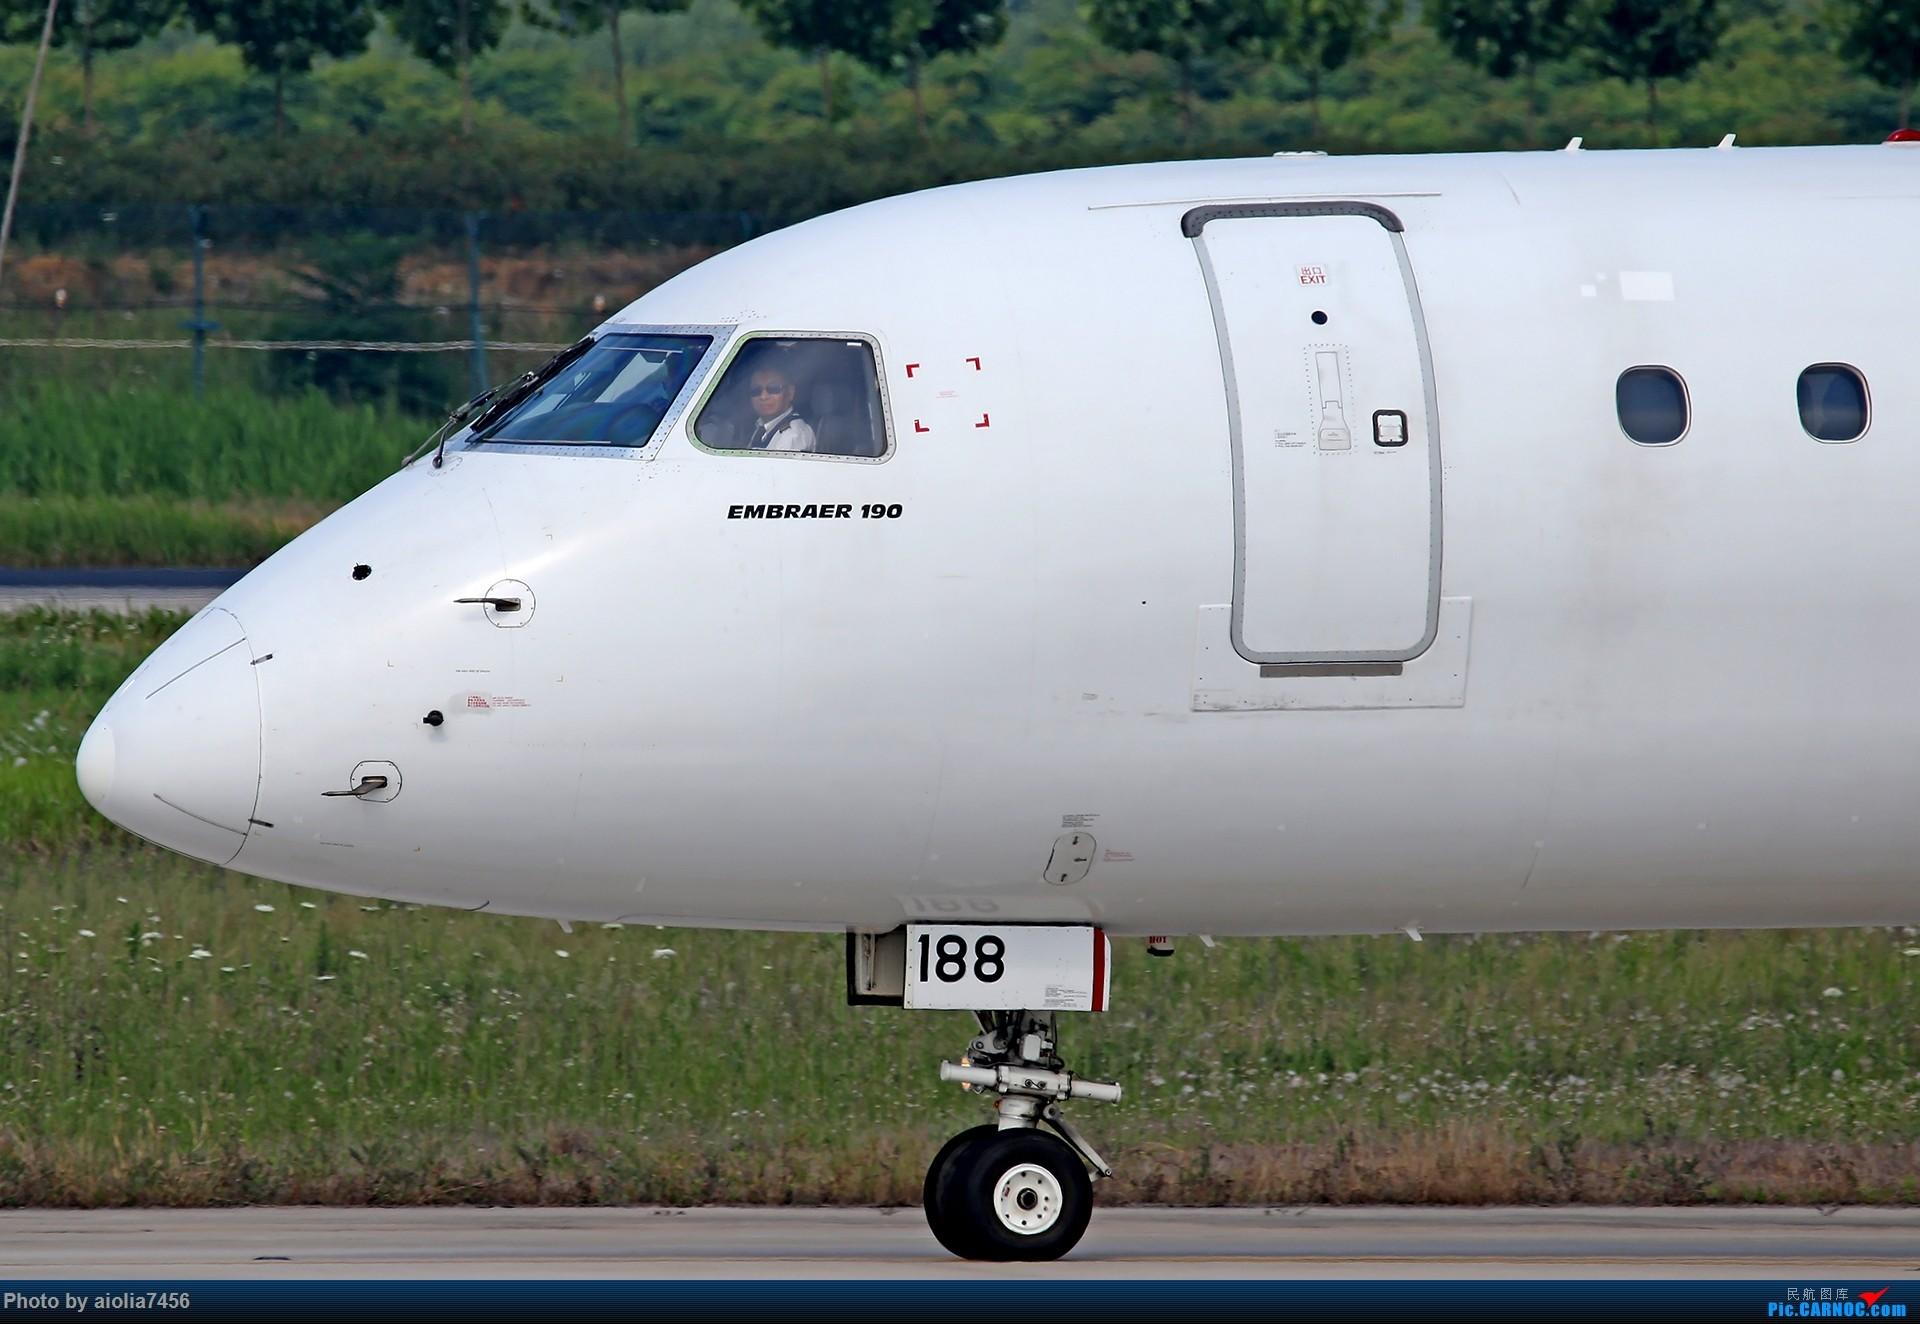 Re:[原创]【霸都打鸡队】F4新桥拍机!(爆人) EMBRAER E-190 B-3188 中国合肥新桥国际机场